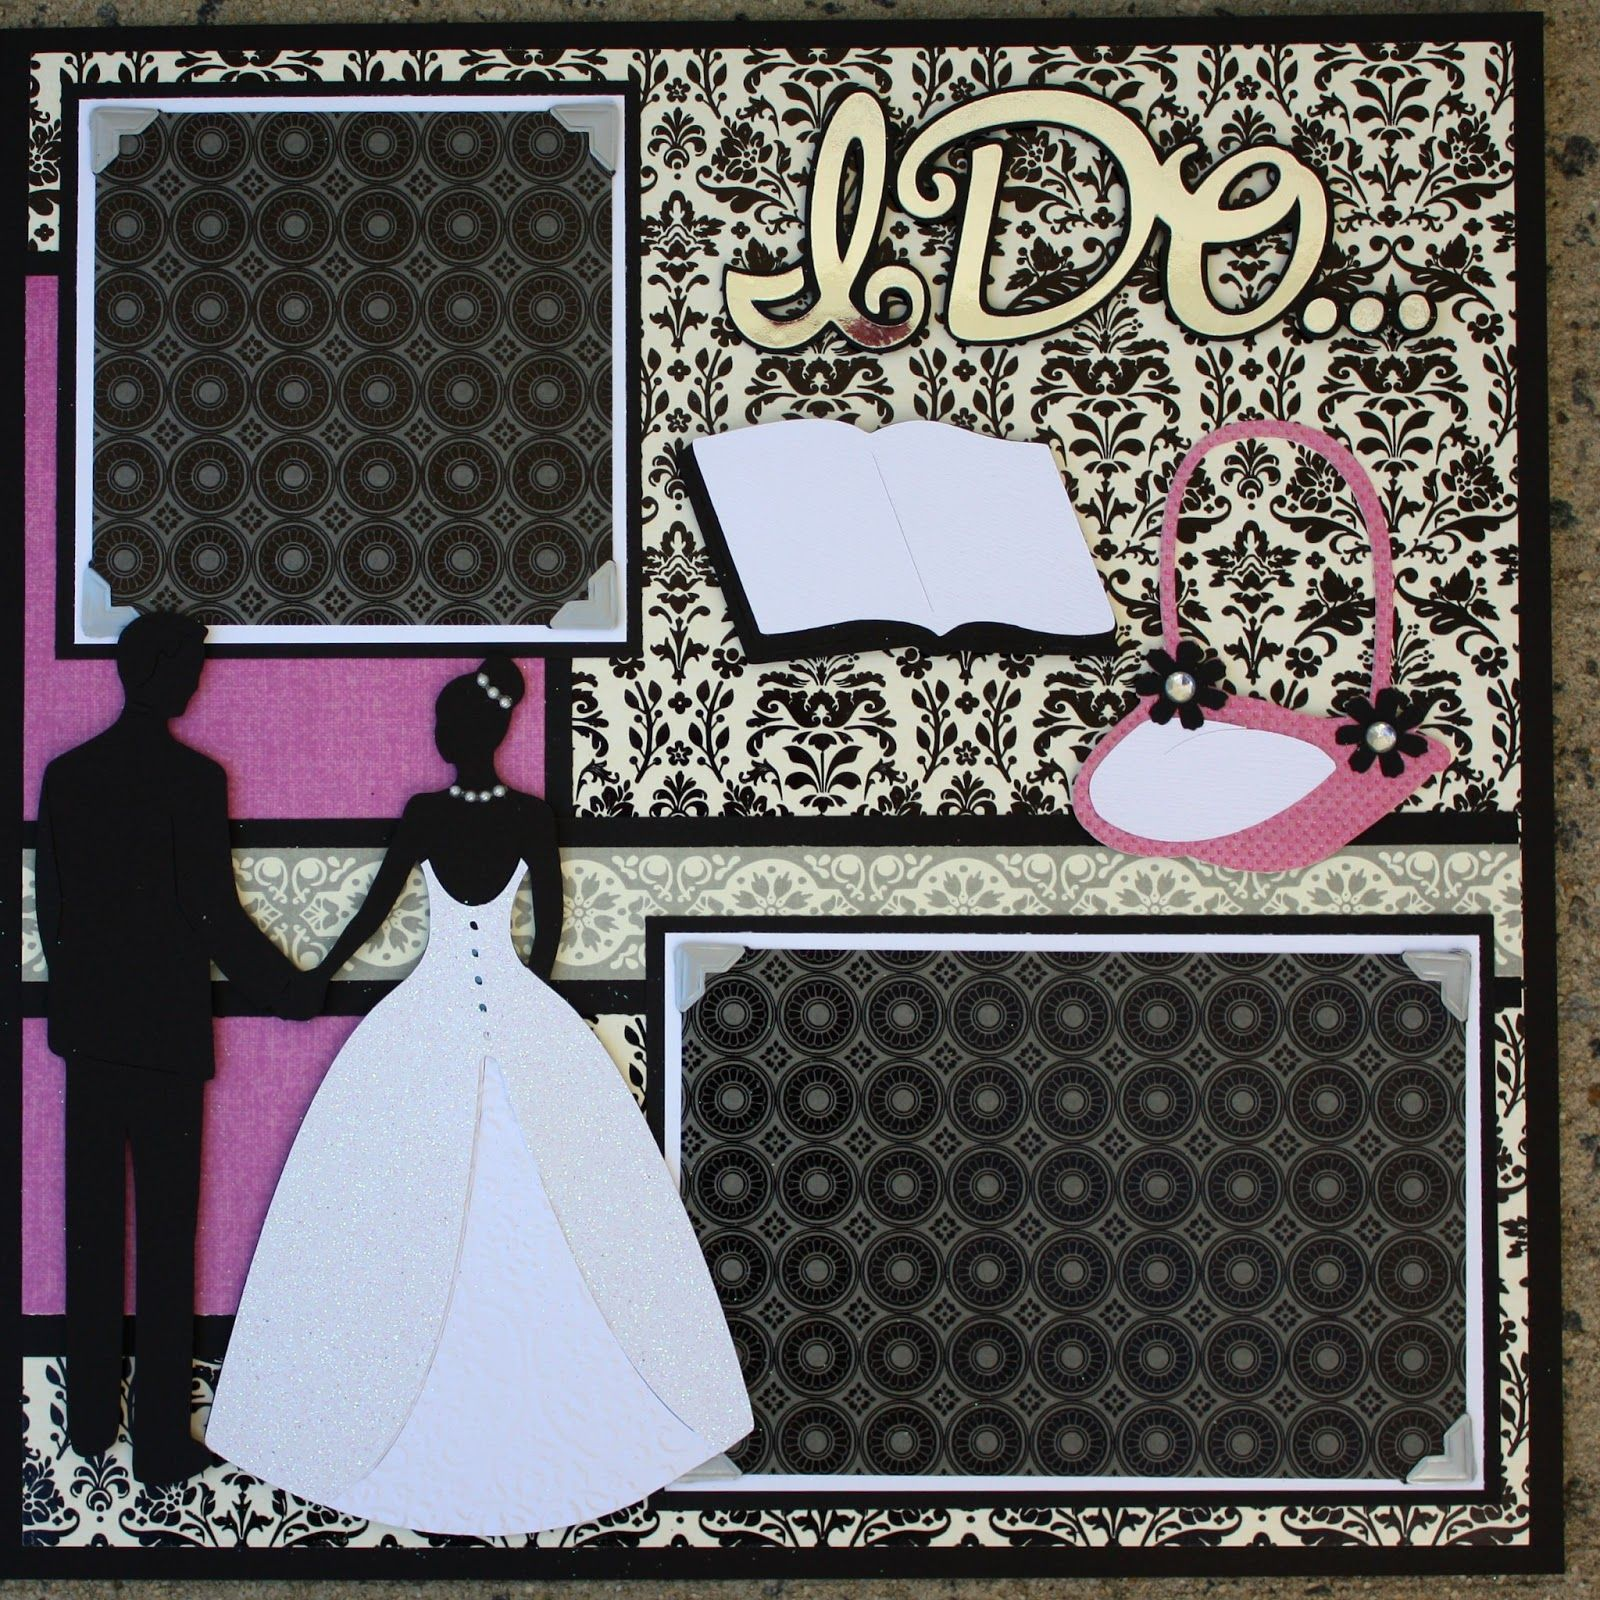 Wedding scrapbook ideas layouts - Complete Wedding Album Series Tie The Knot 12x12 Double Scrapbook Layout Faith Abigail Designs